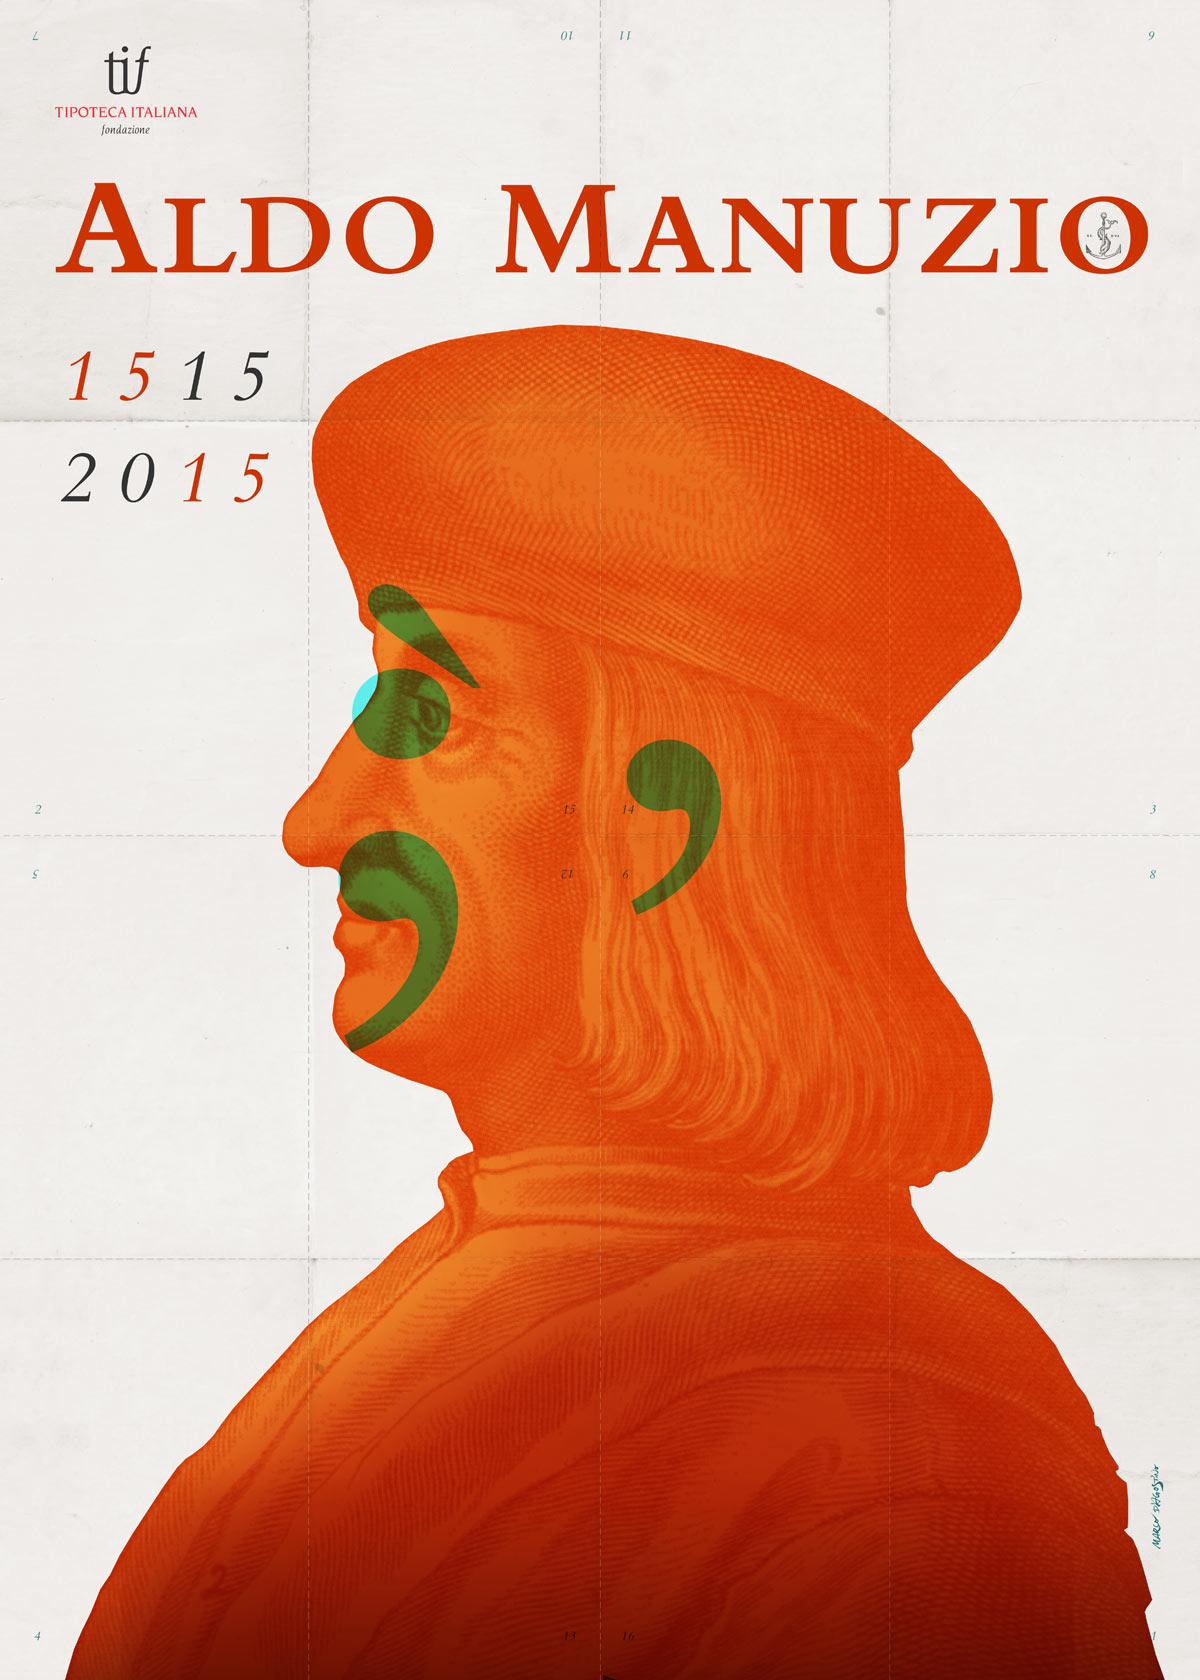 Aldo Manuzio, Manifesto